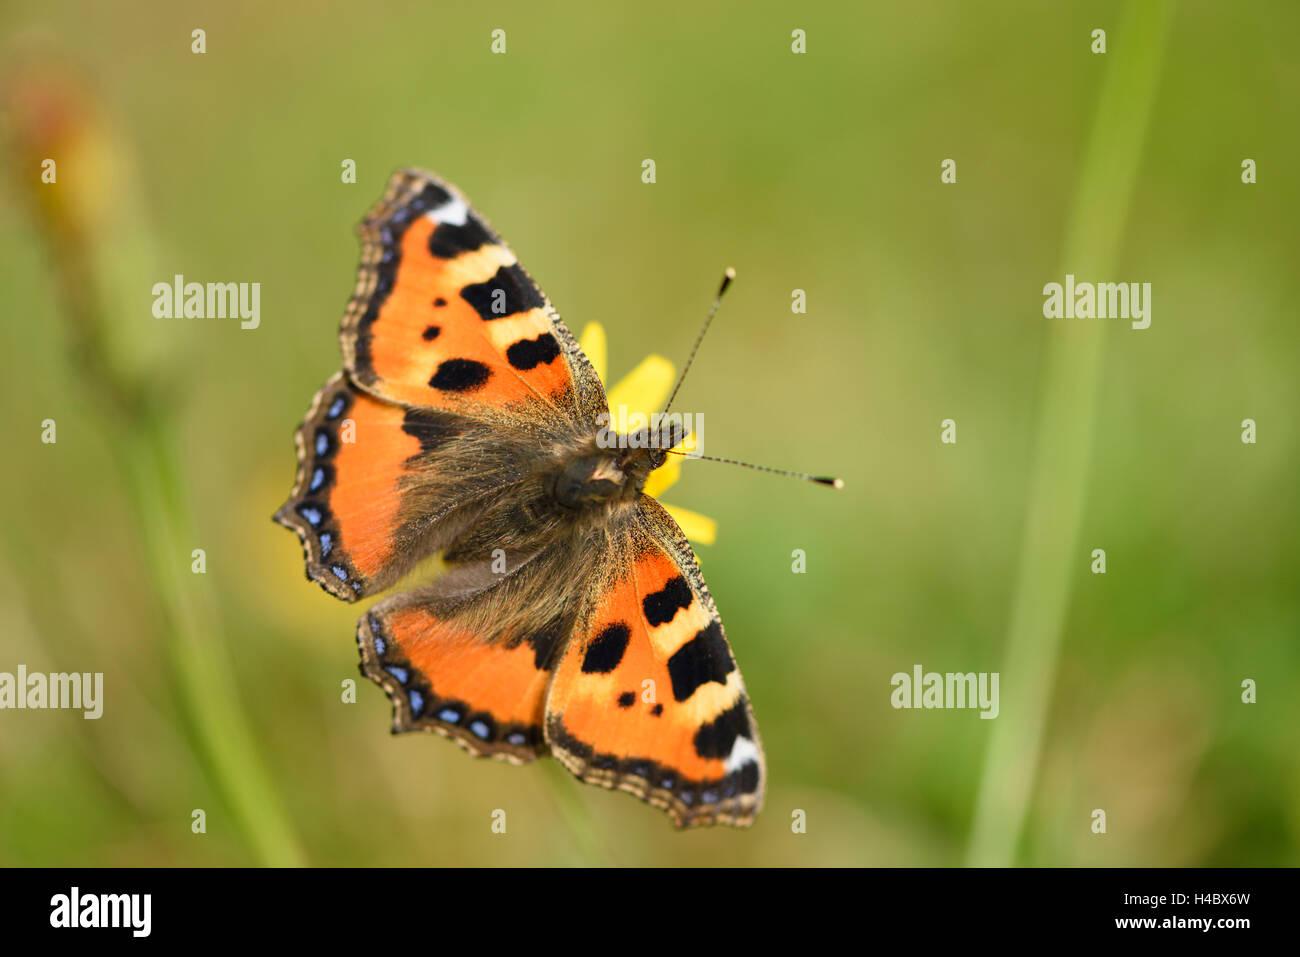 Kleiner Fuchs, Aglais Urticae, Blüte, sitzen, Bestäubung, Rückansicht Stockbild